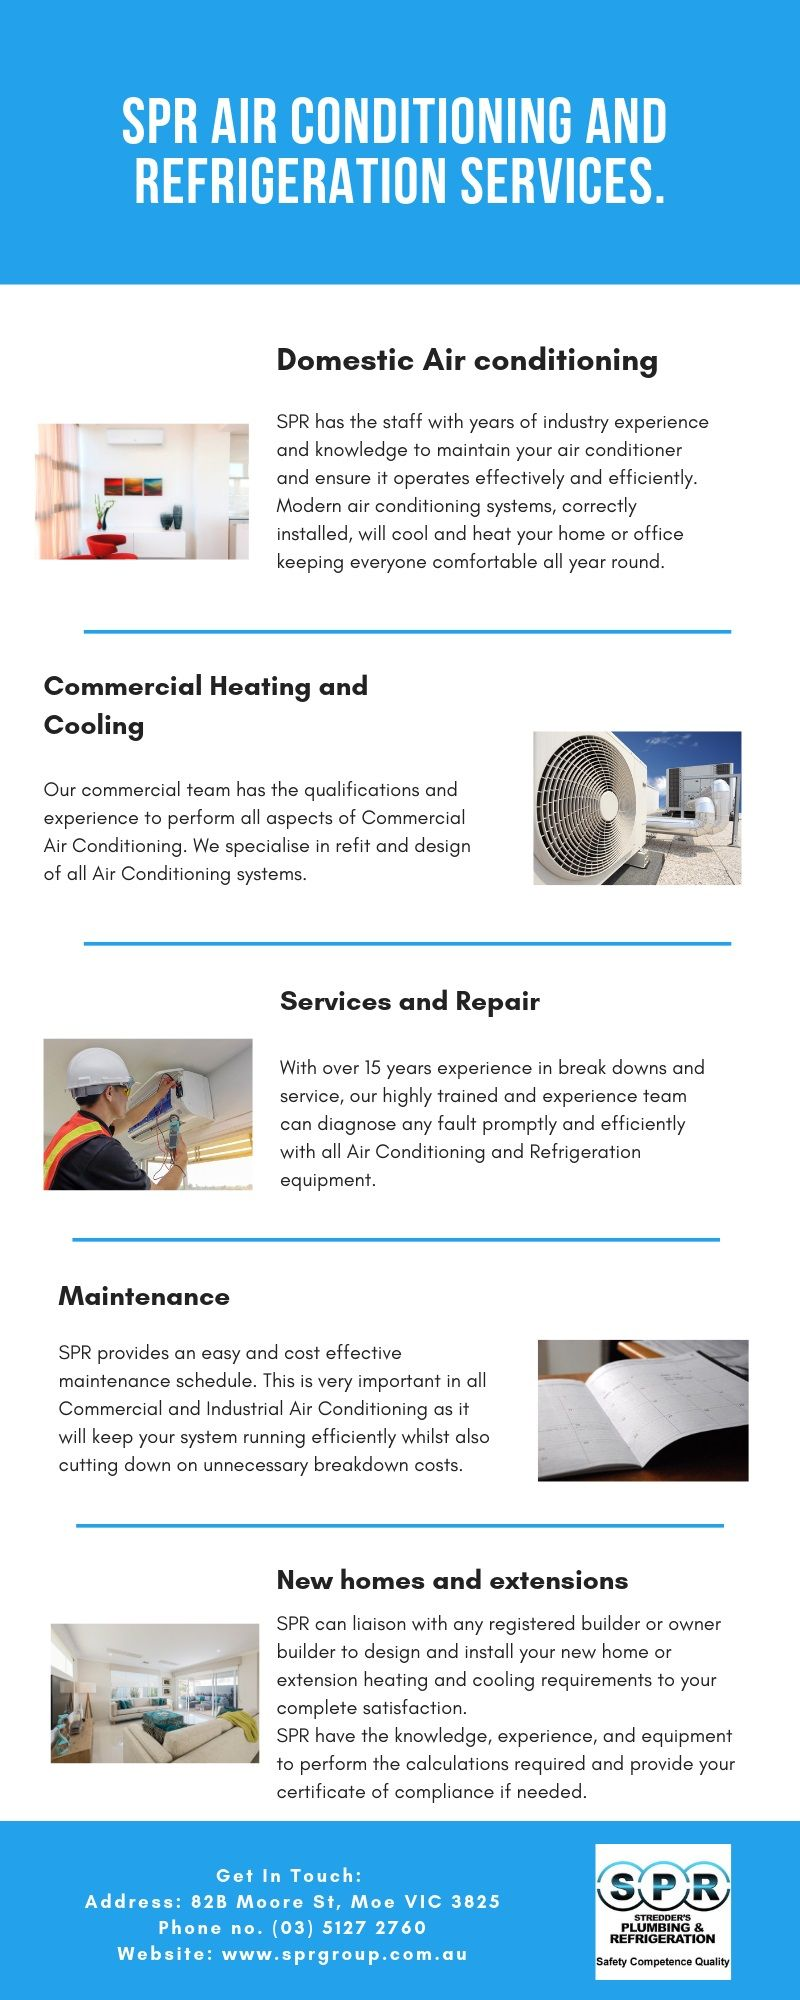 Plumbing Company Domestic Air Conditioning Plumbing Companies